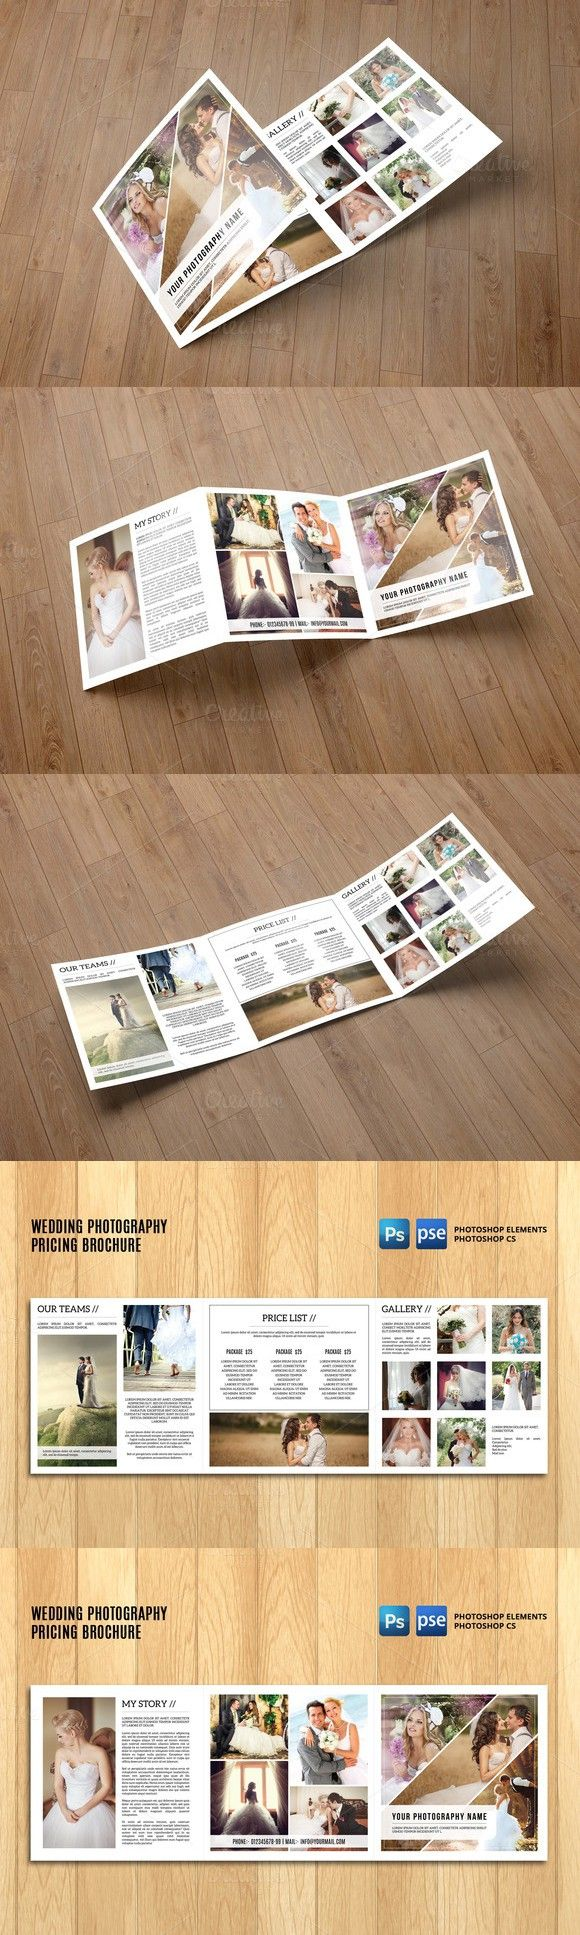 Wedding Photography Brochure-V530